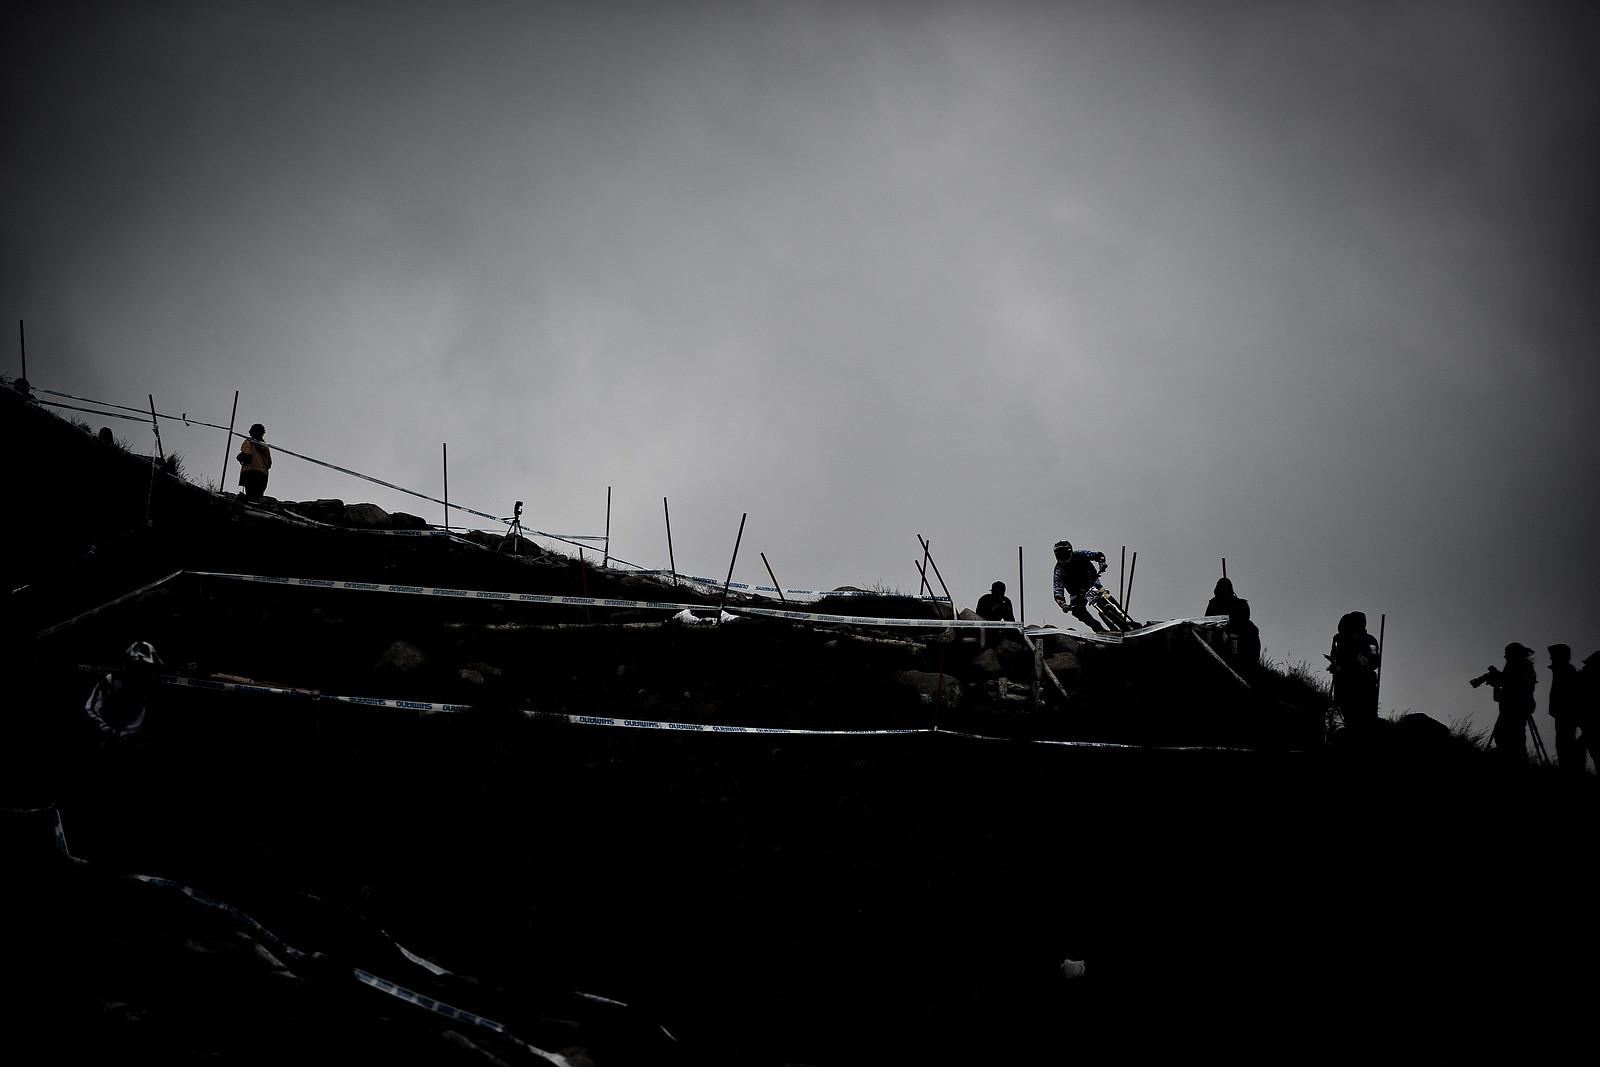 Matt Simmonds - 2012 UCI World Cup, Fort WIlliam Scotland, Day 2 - Mountain Biking Pictures - Vital MTB